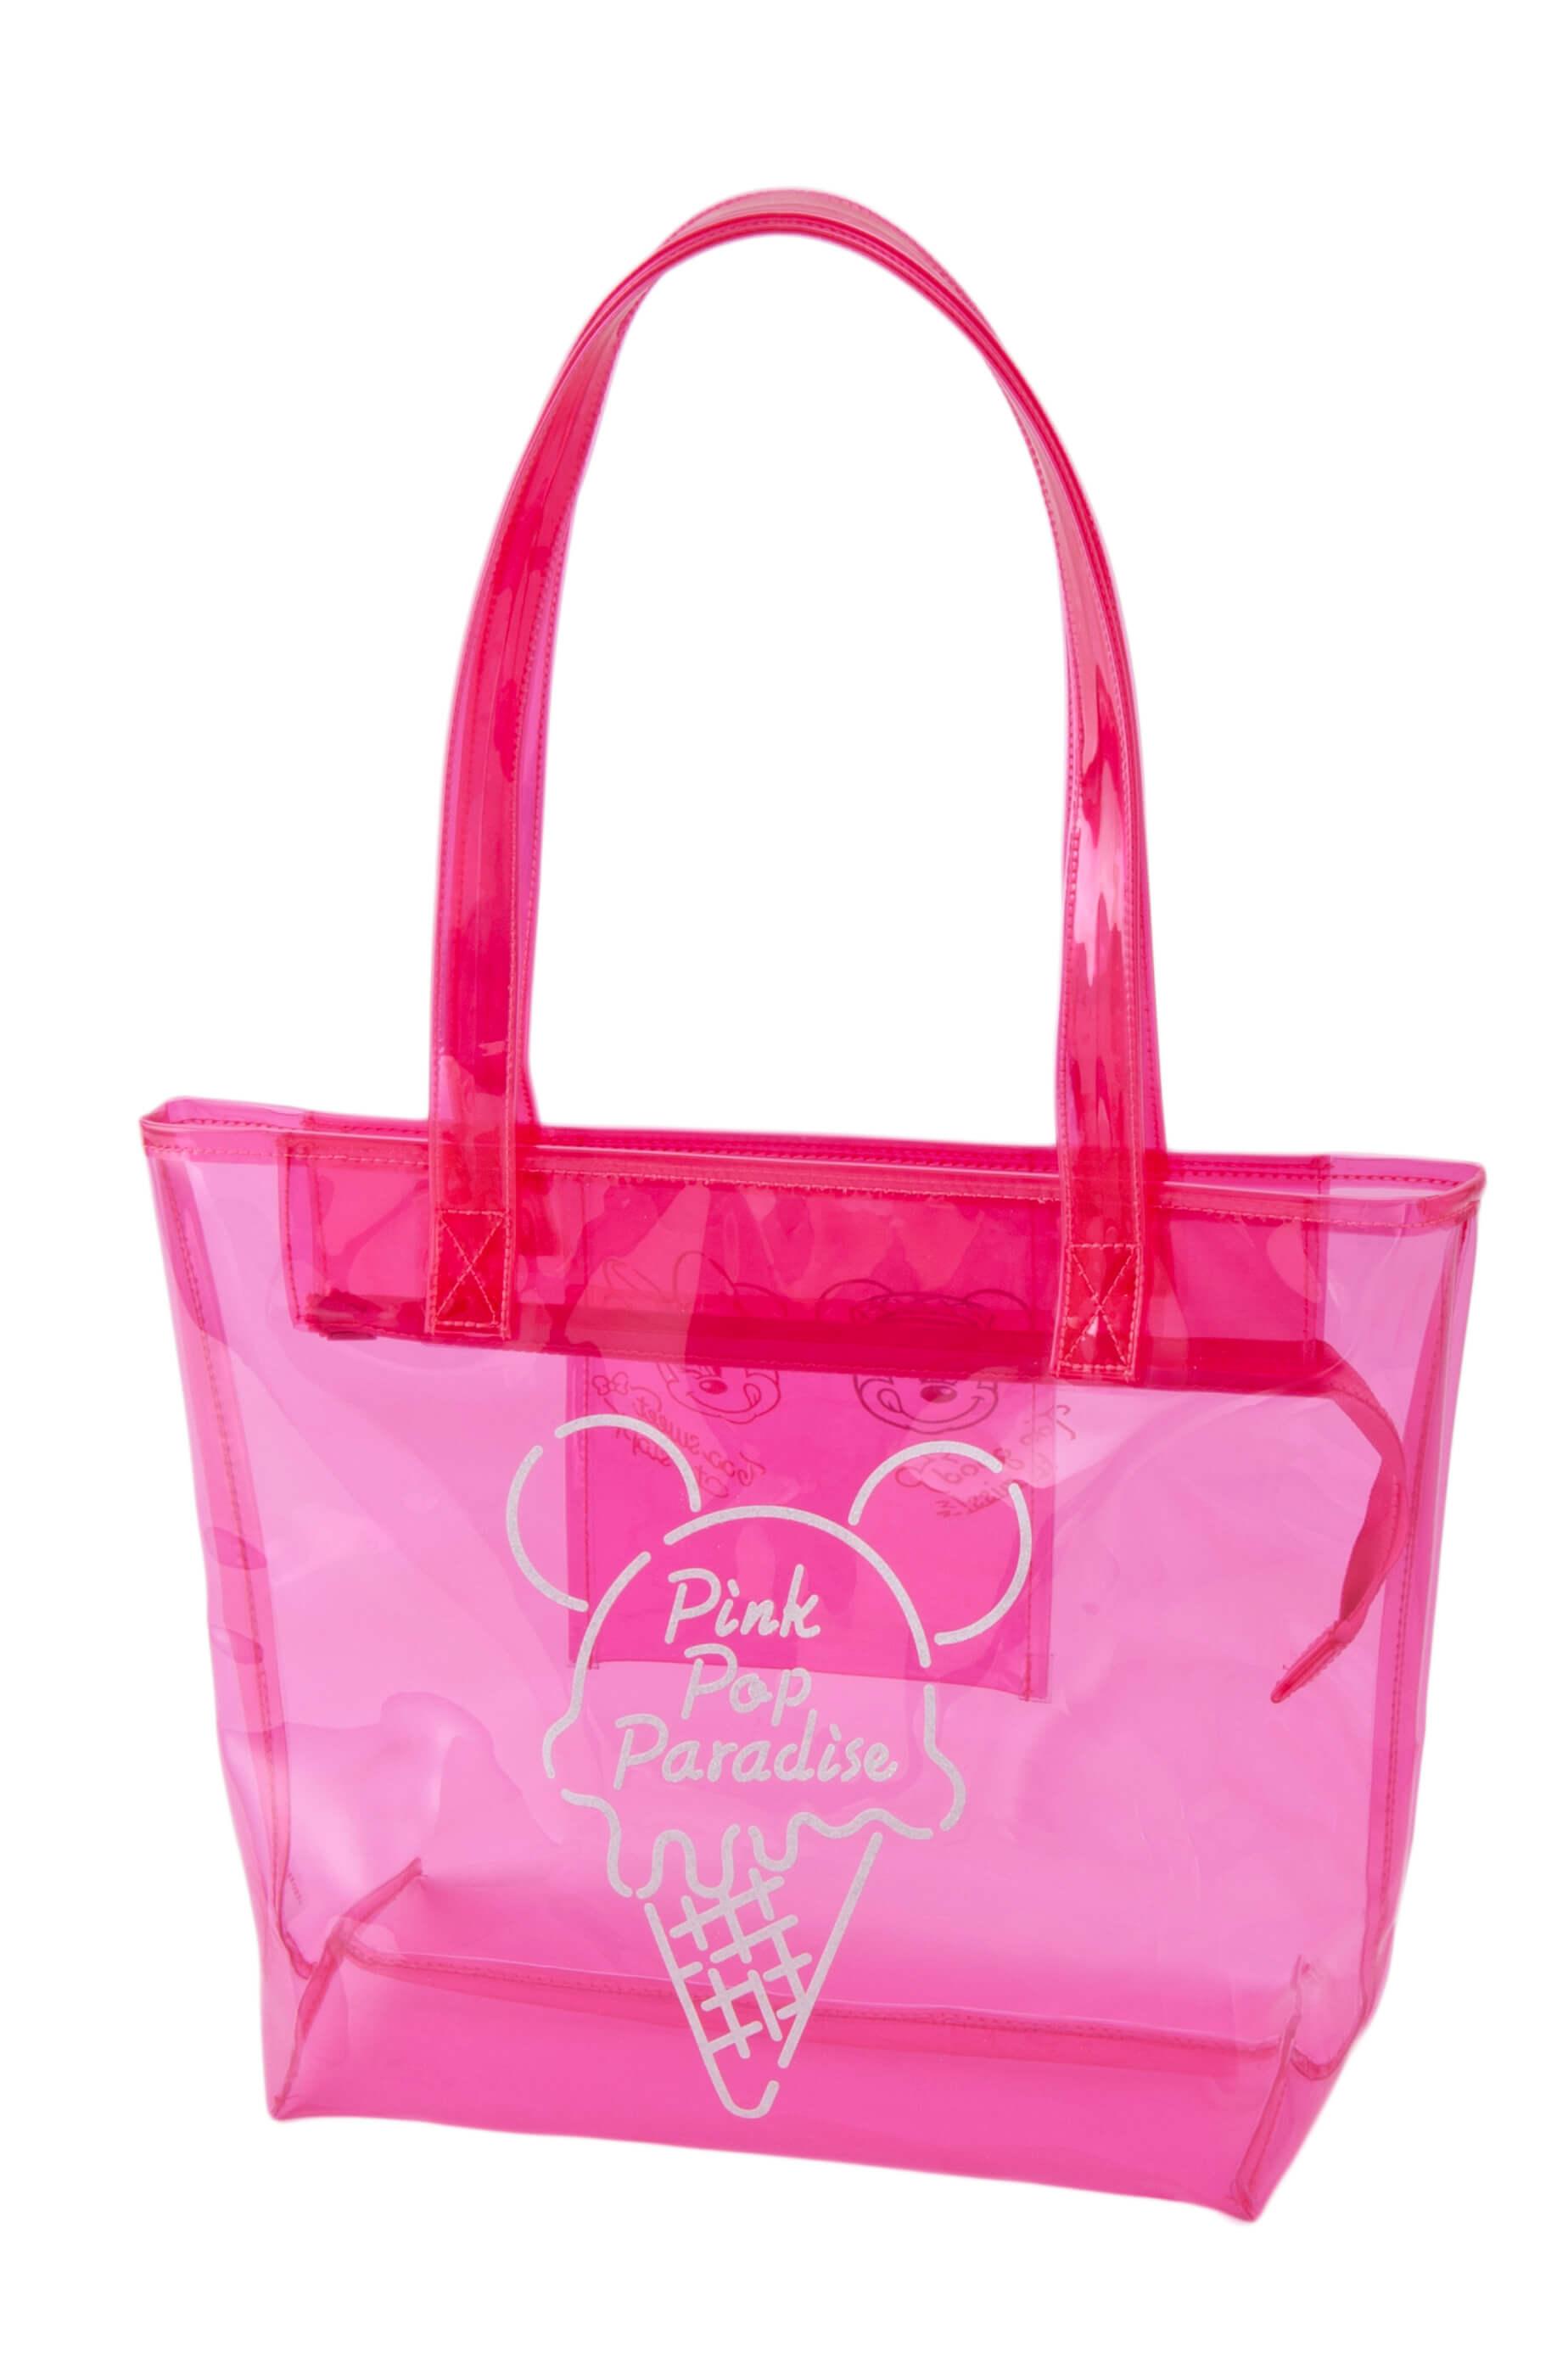 %e6%9d%b1%e4%ba%ac%e3%83%86%e3%82%99%e3%82%a3%e3%82%b9%e3%82%99%e3%83%8b%e3%83%bc%e3%83%aa%e3%82%bd%e3%82%99%e3%83%bc%e3%83%88-pink-pop-paradise-tokyo-disney-resort-6-2